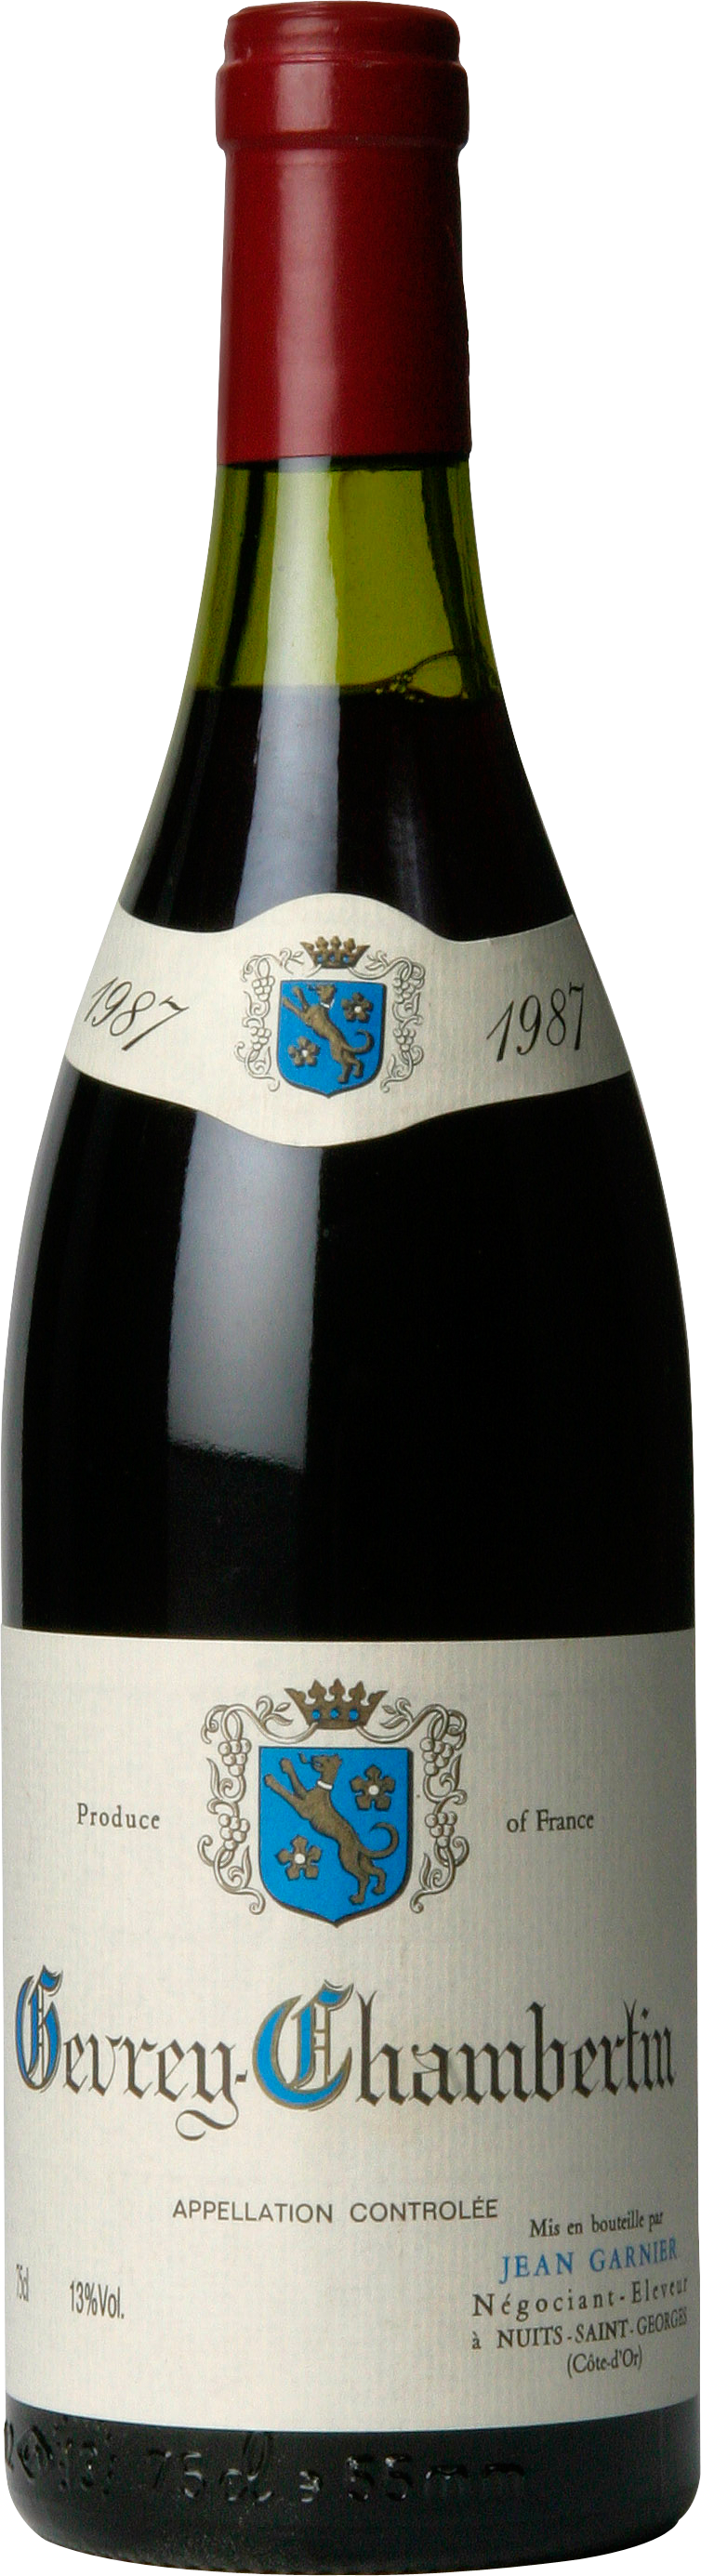 Wine Bottle Png Image Wine Bottle Bottle Wine